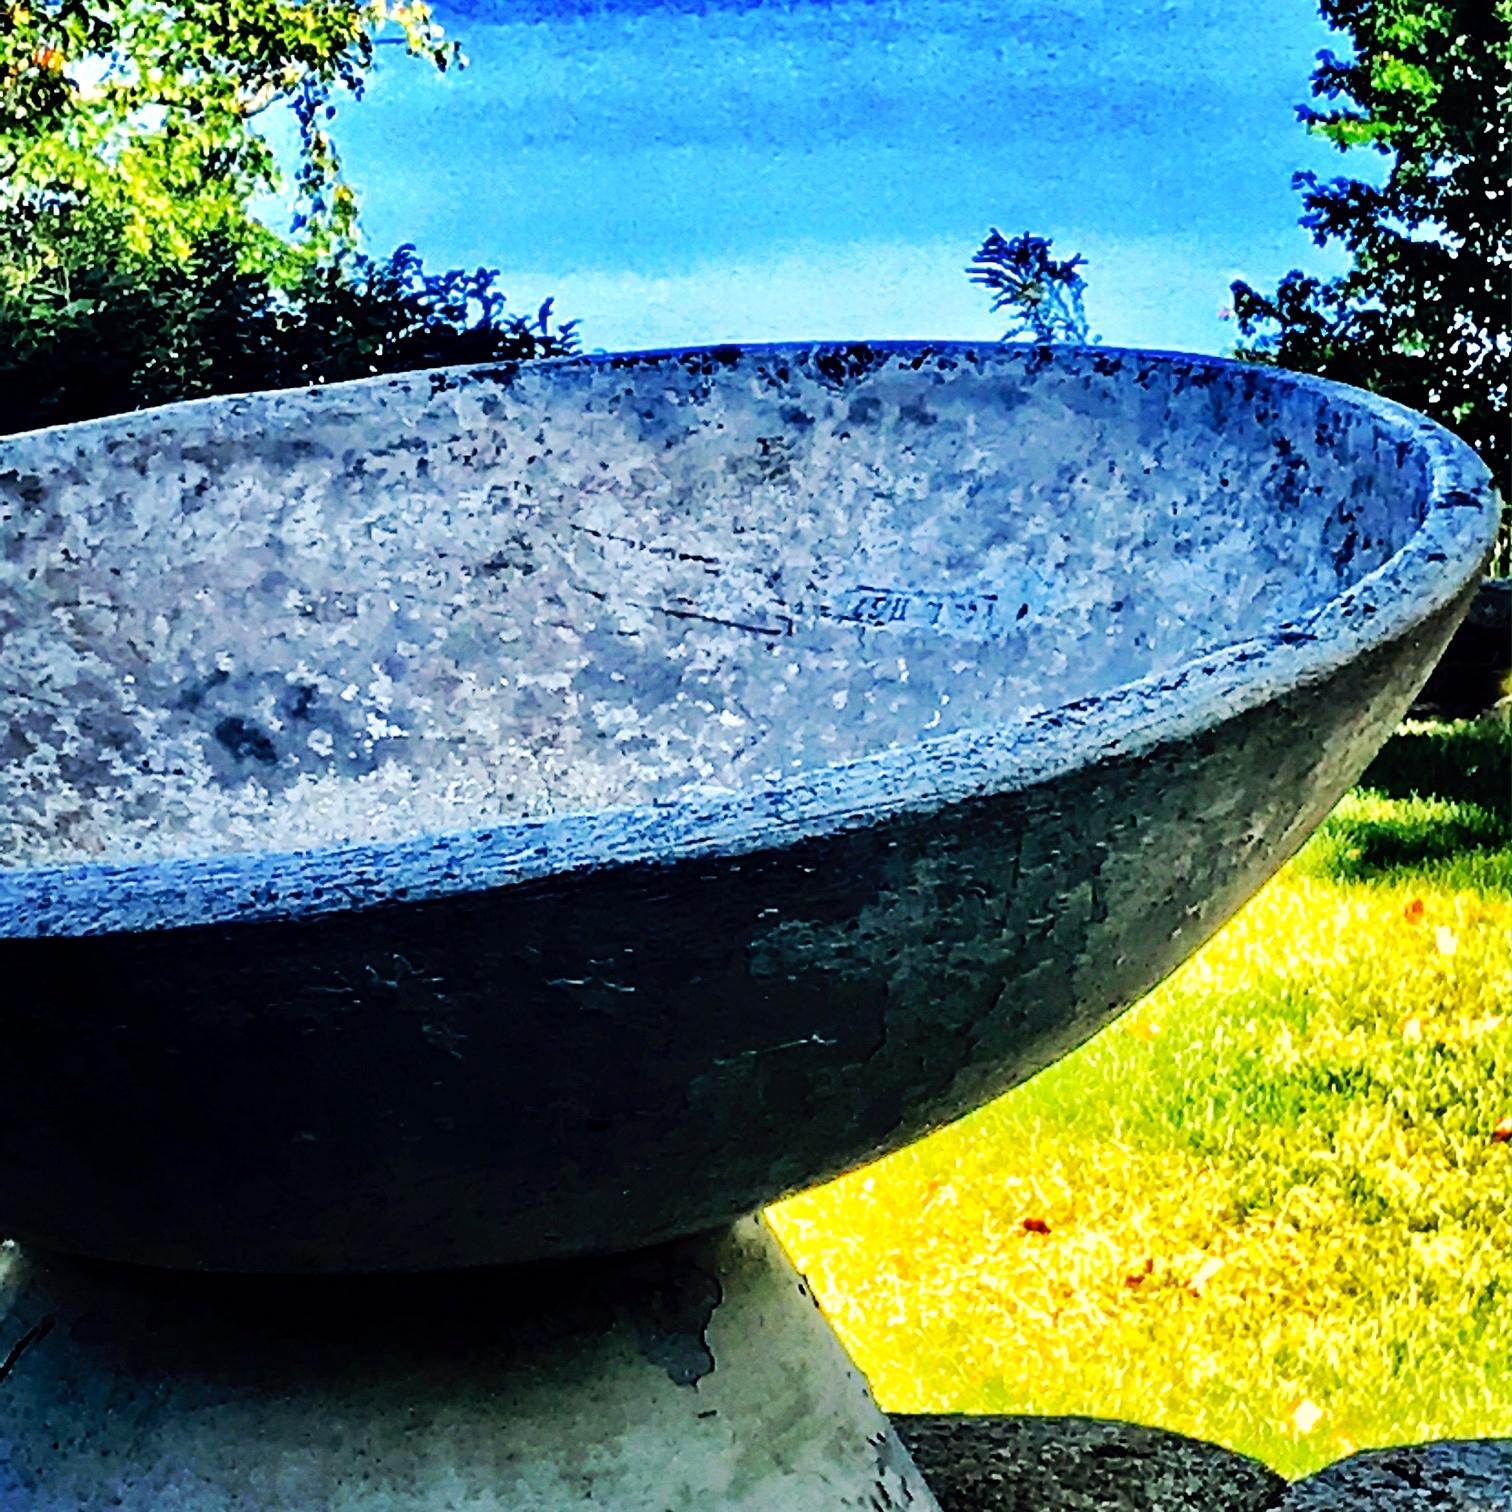 Liz's Blue Bowl, Farm Pond View